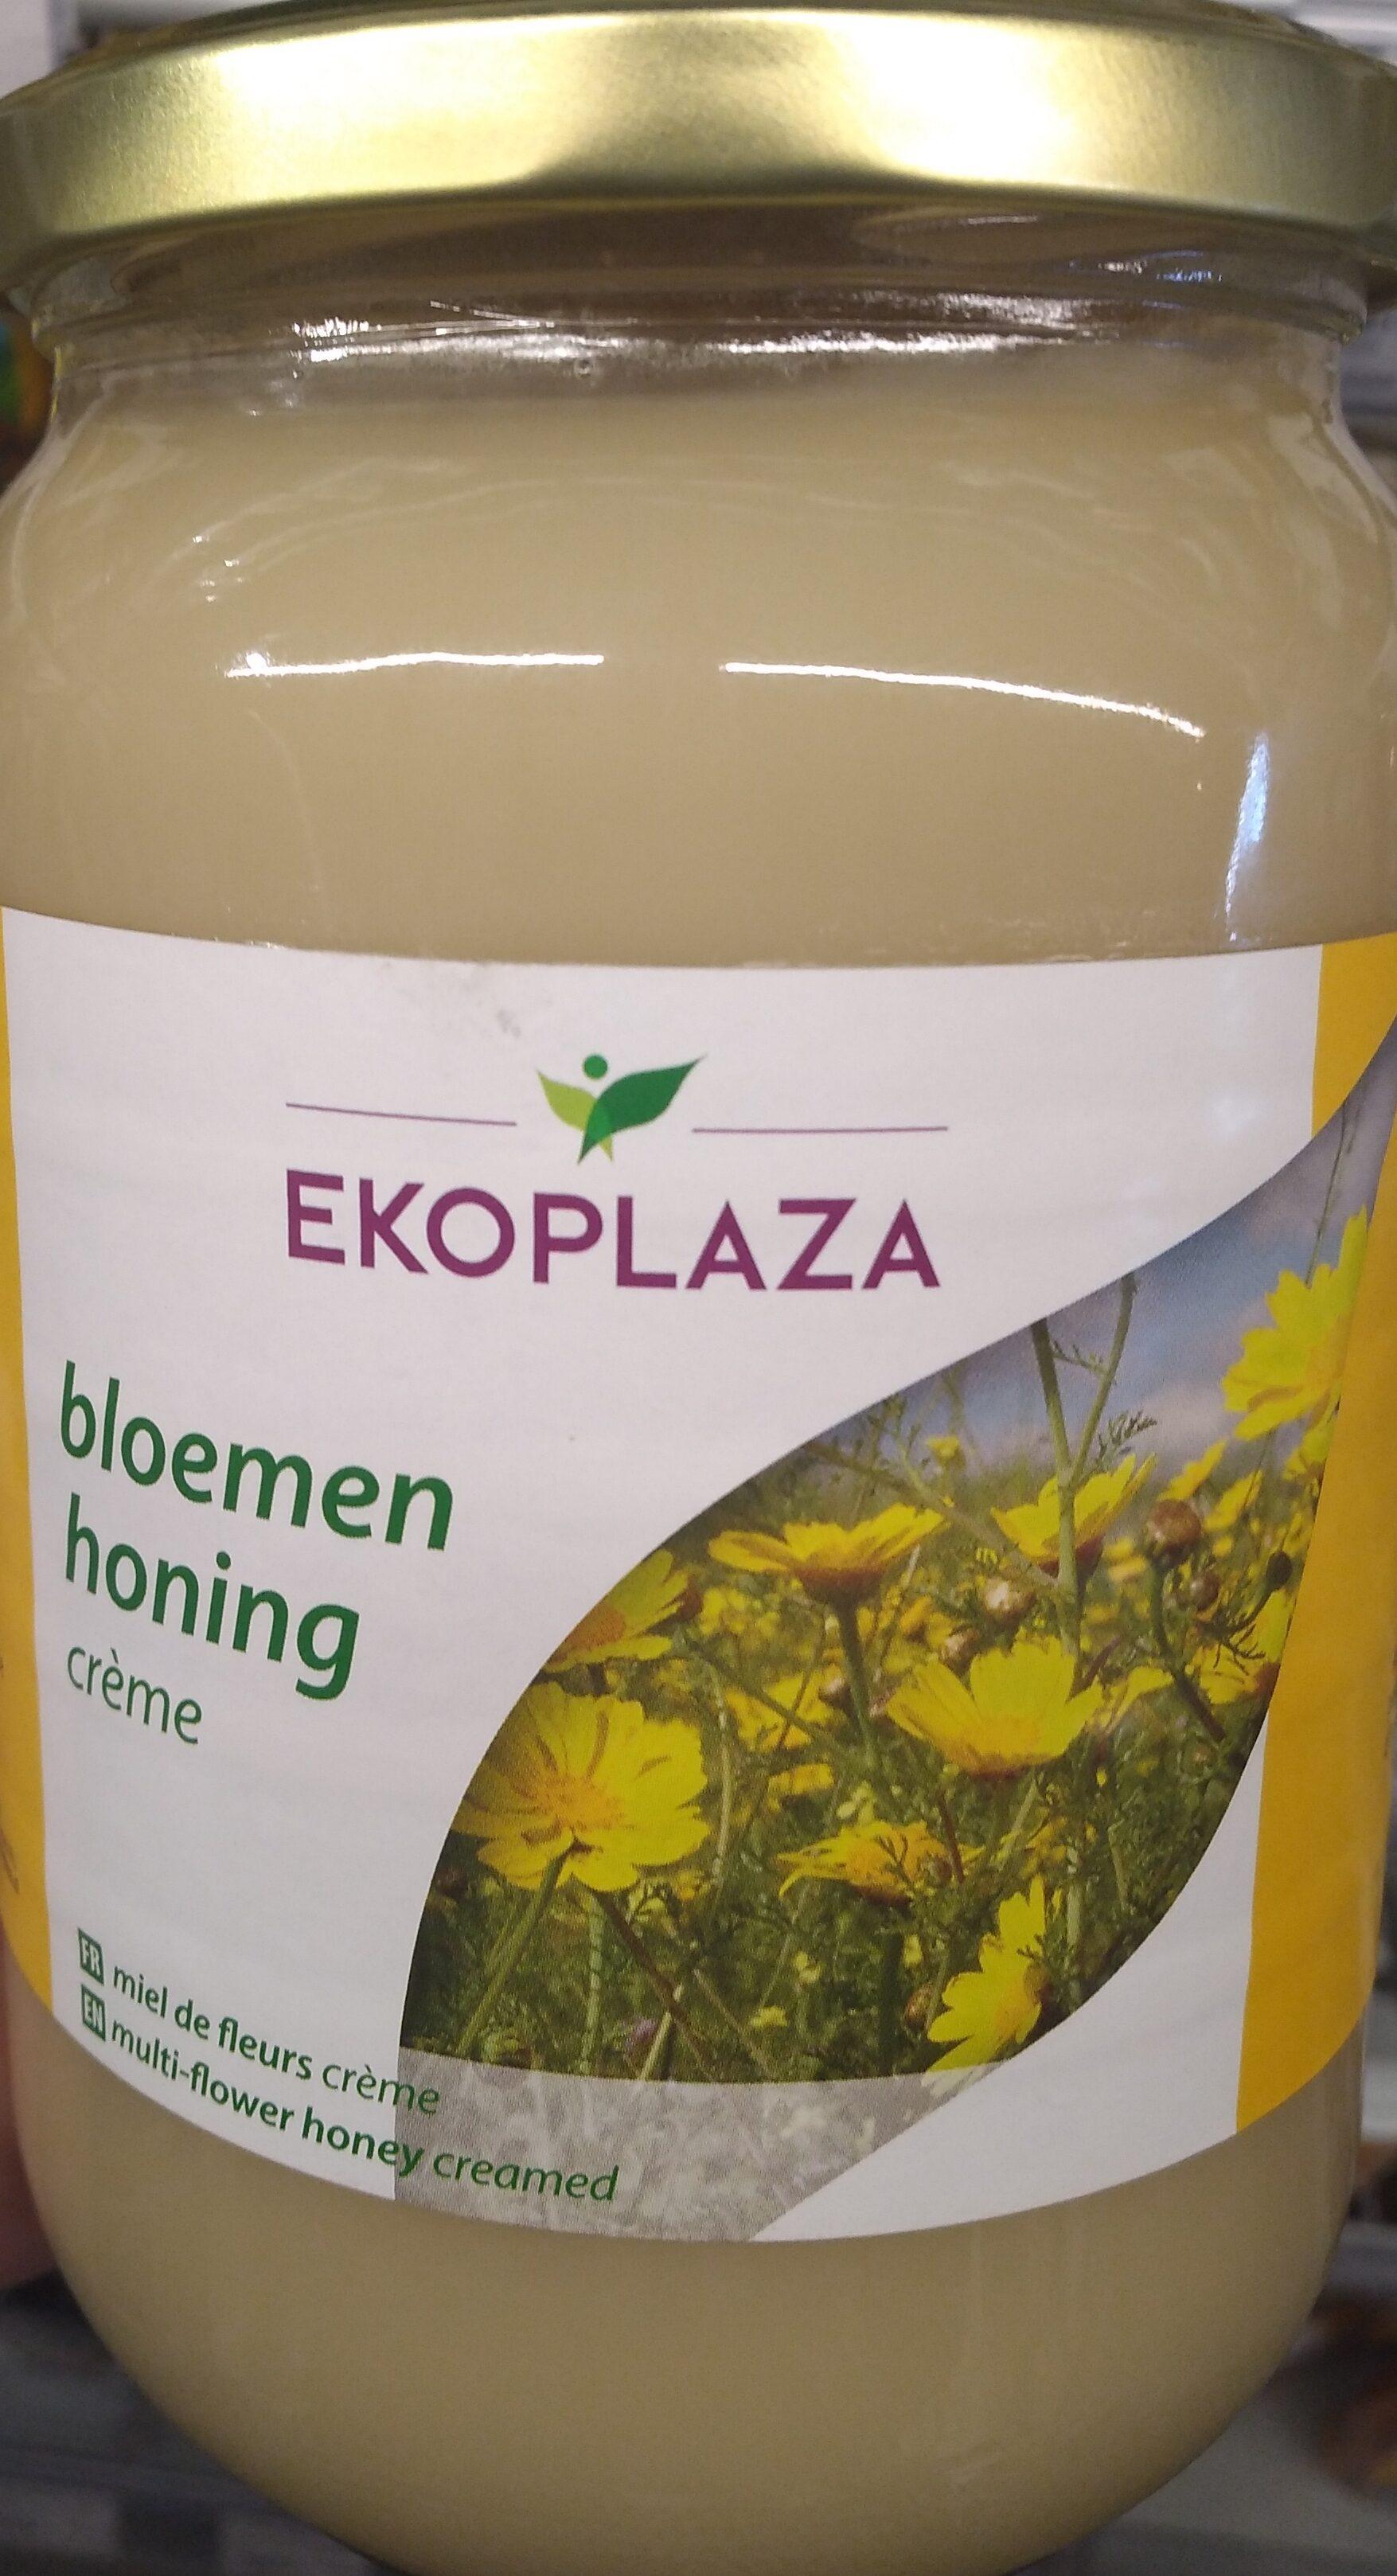 Bloemenhoning crème - Product